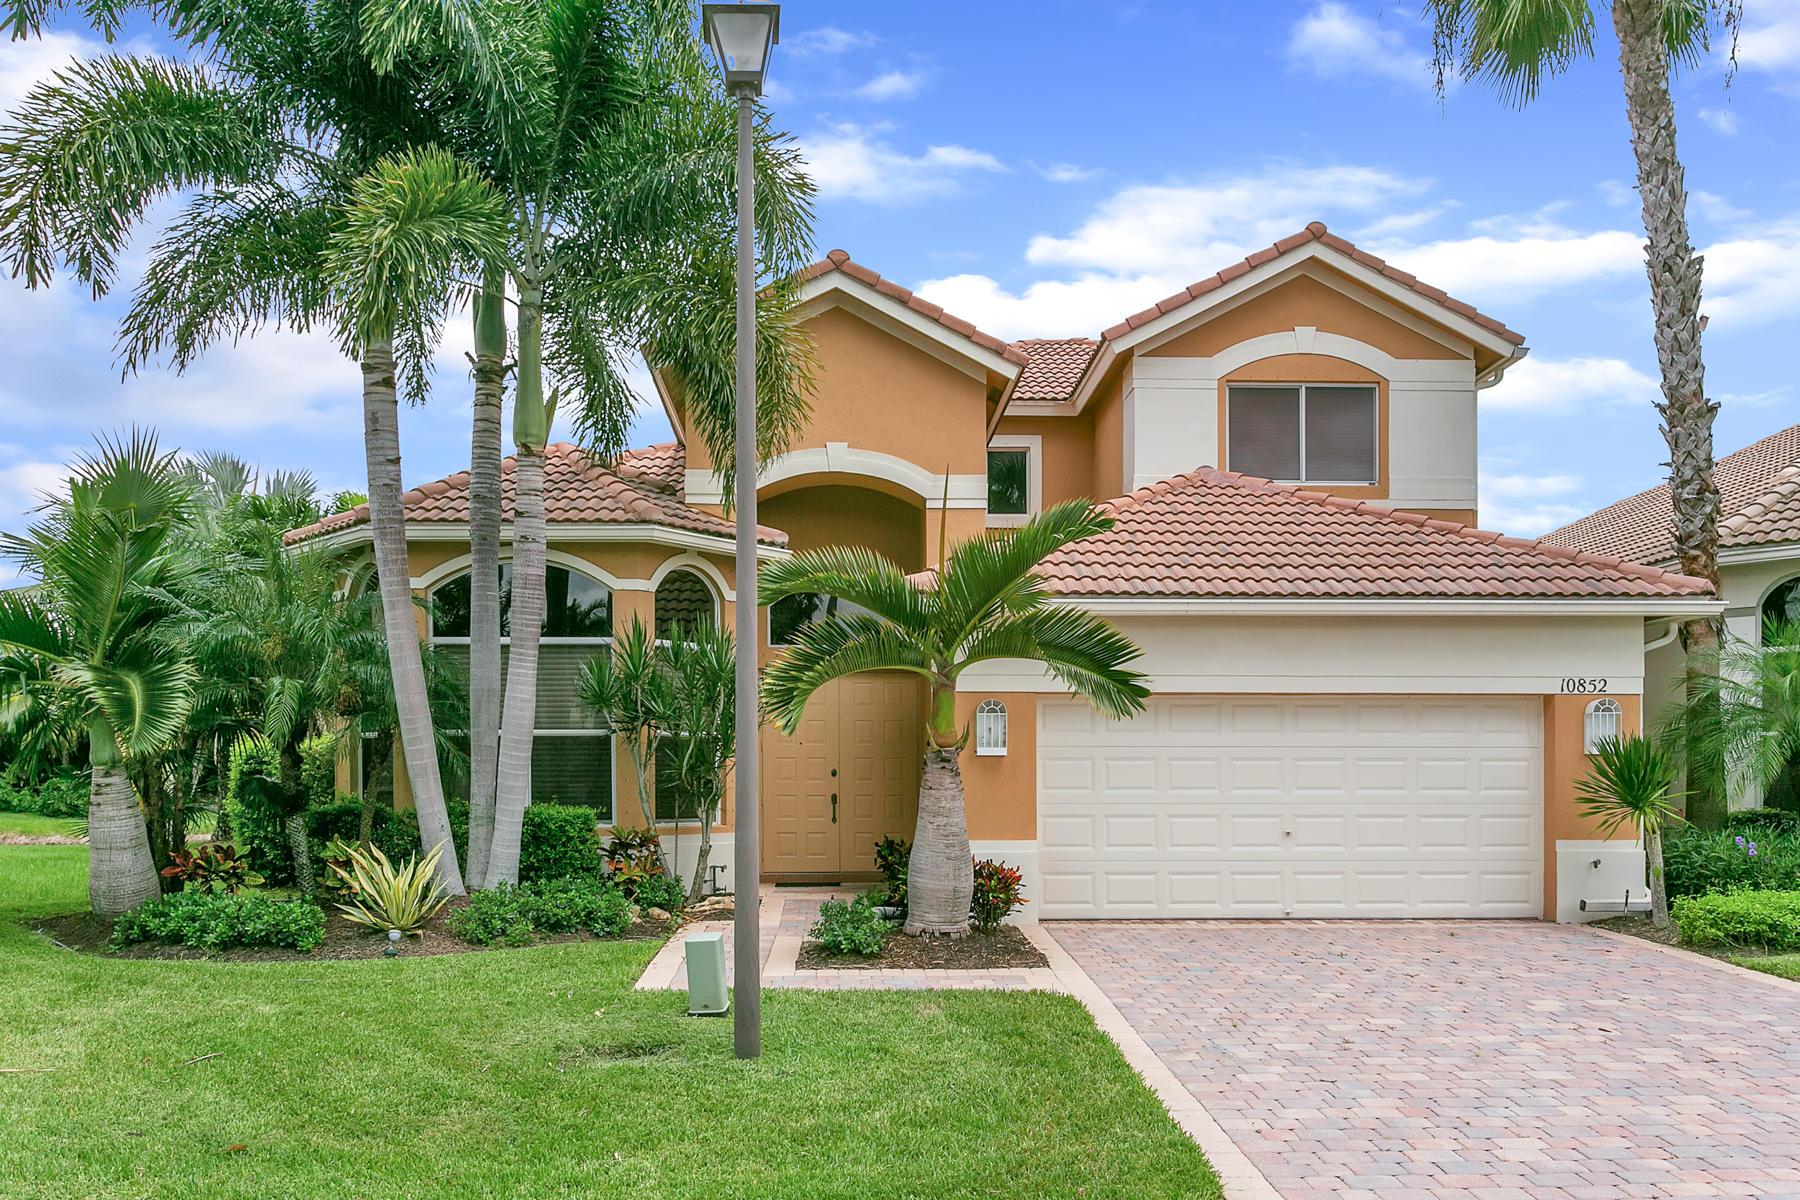 10852 Grande Boulevard West Palm Beach, FL 33412